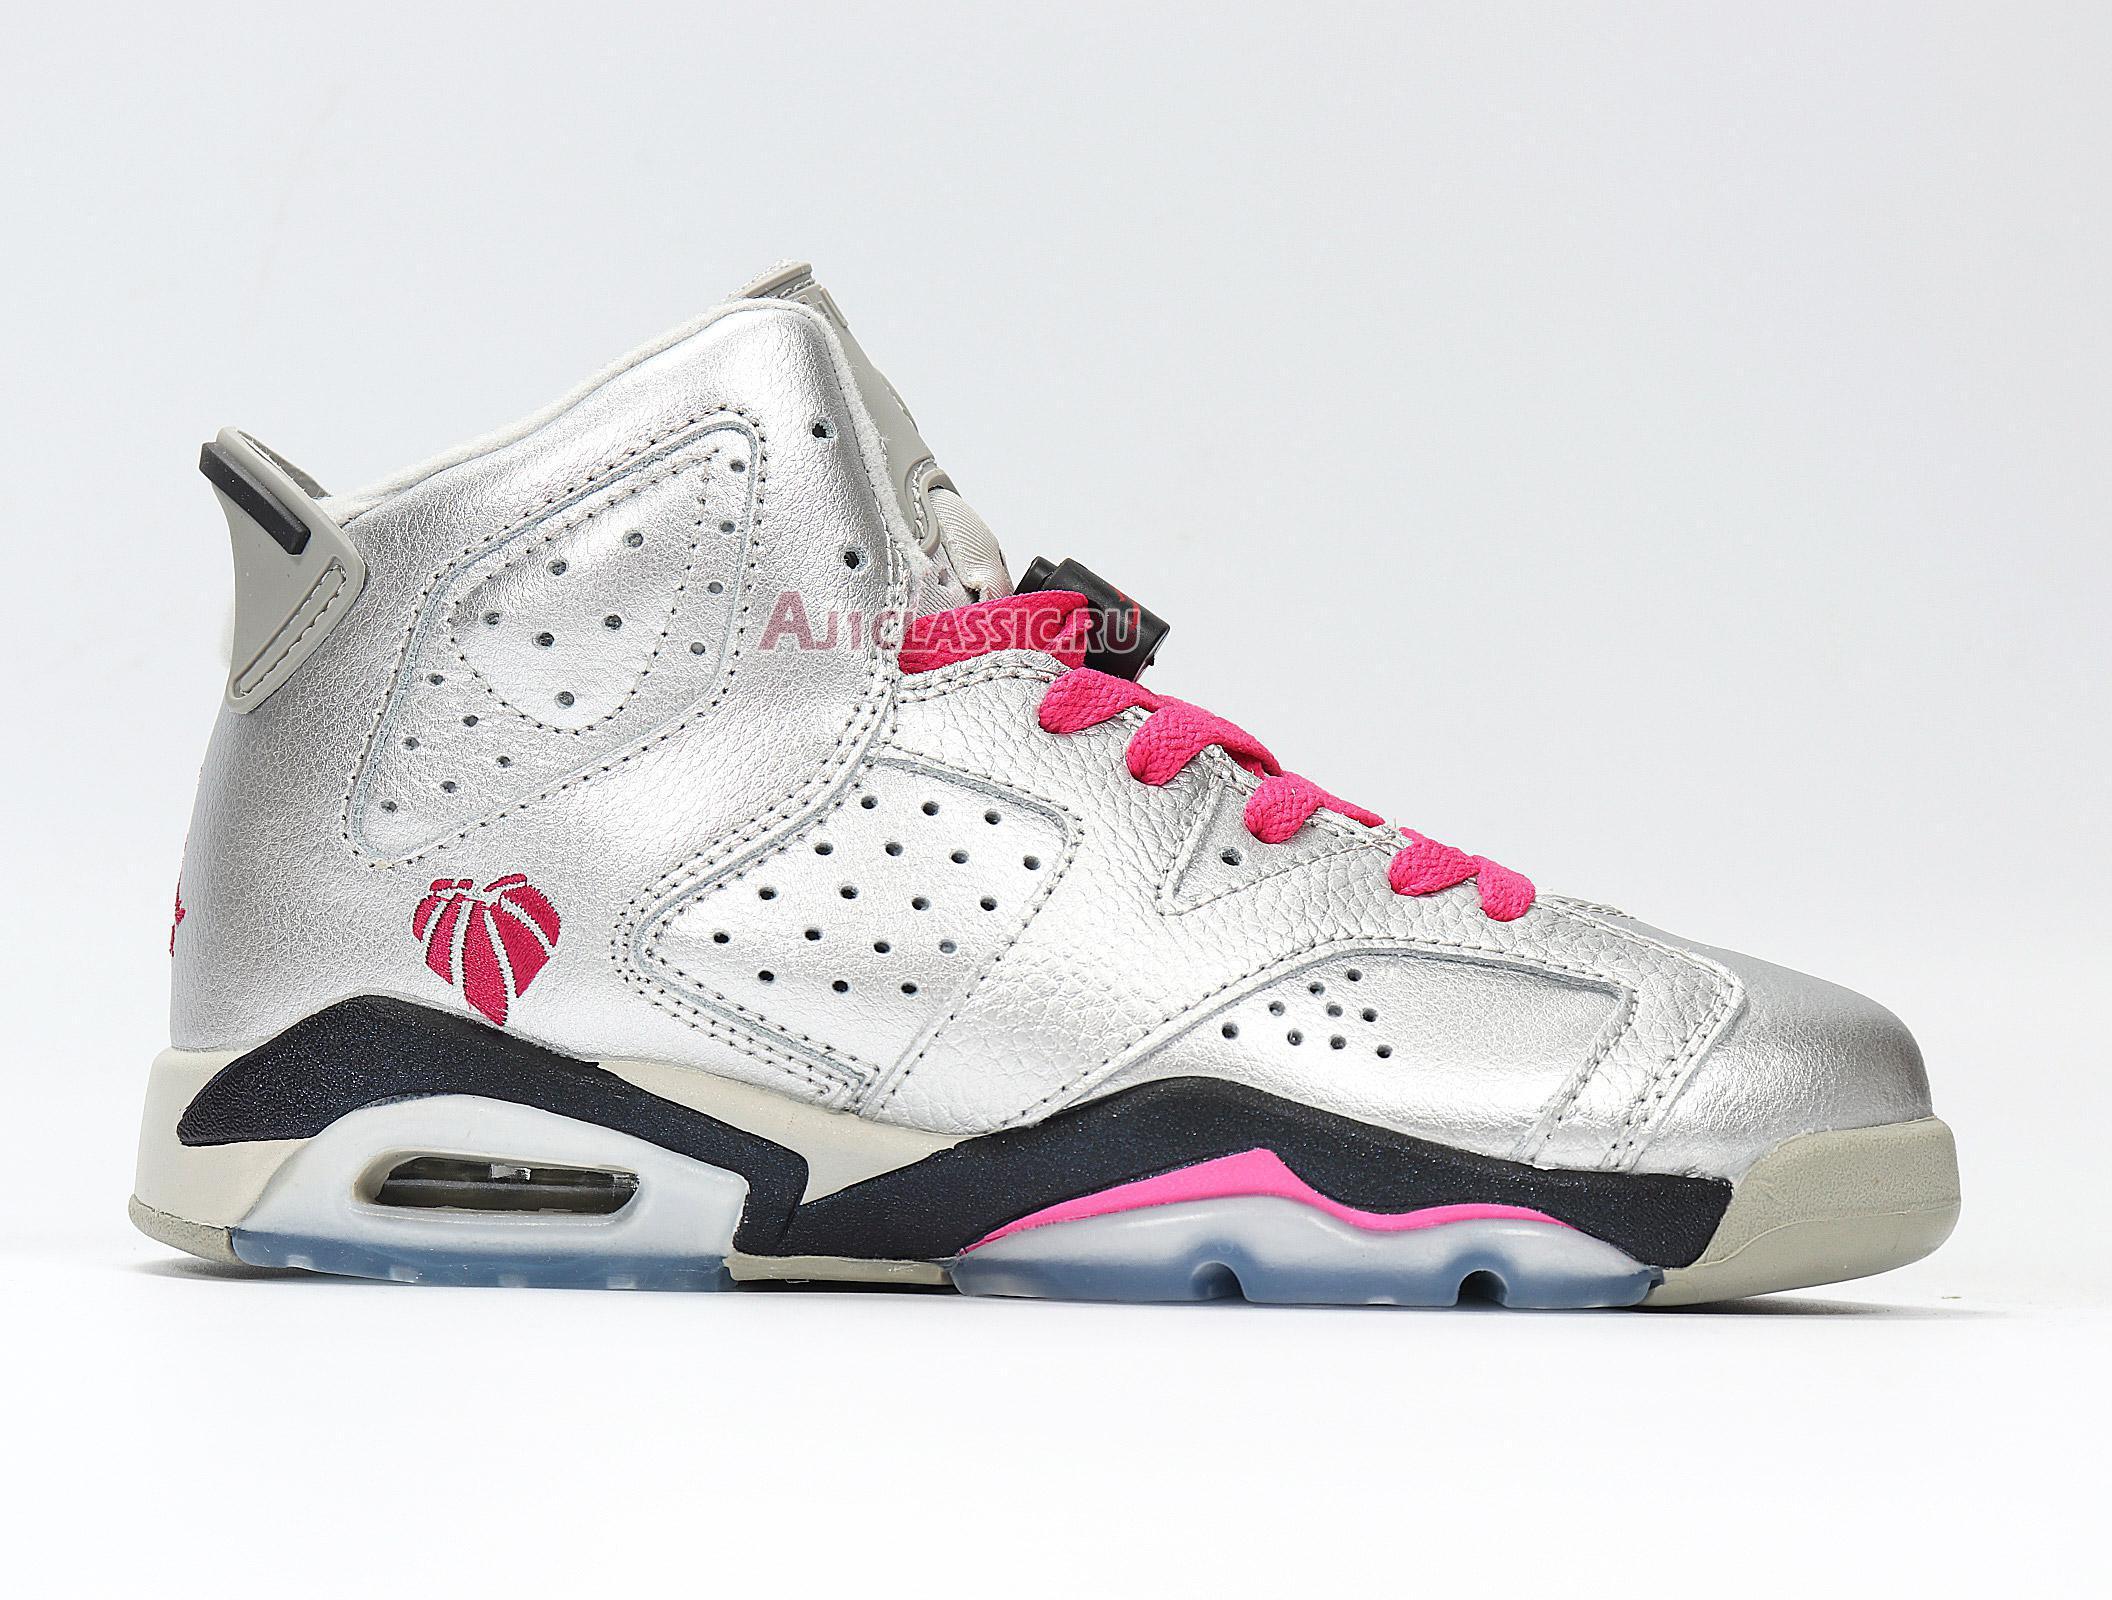 "Air Jordan 6 Retro GG ""Valentines Day"" 543390-009"